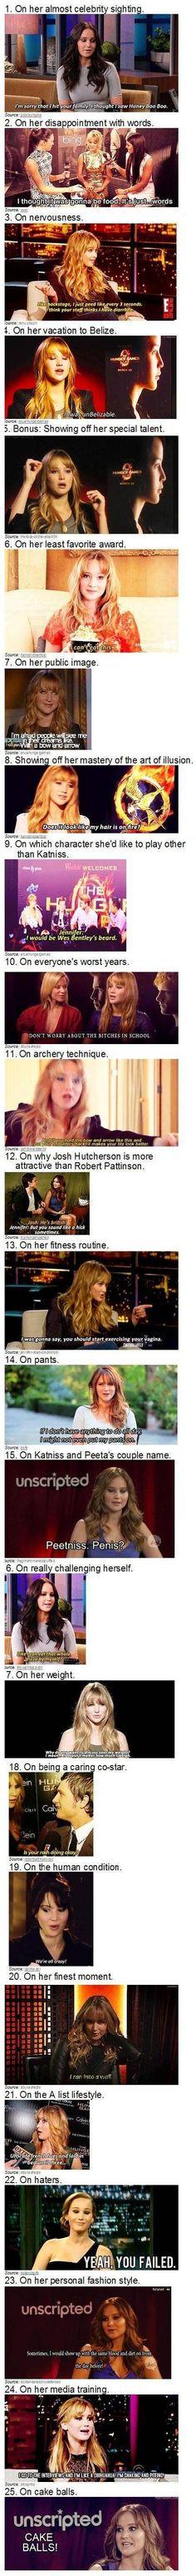 Jennifer Lawrence's brilliance…